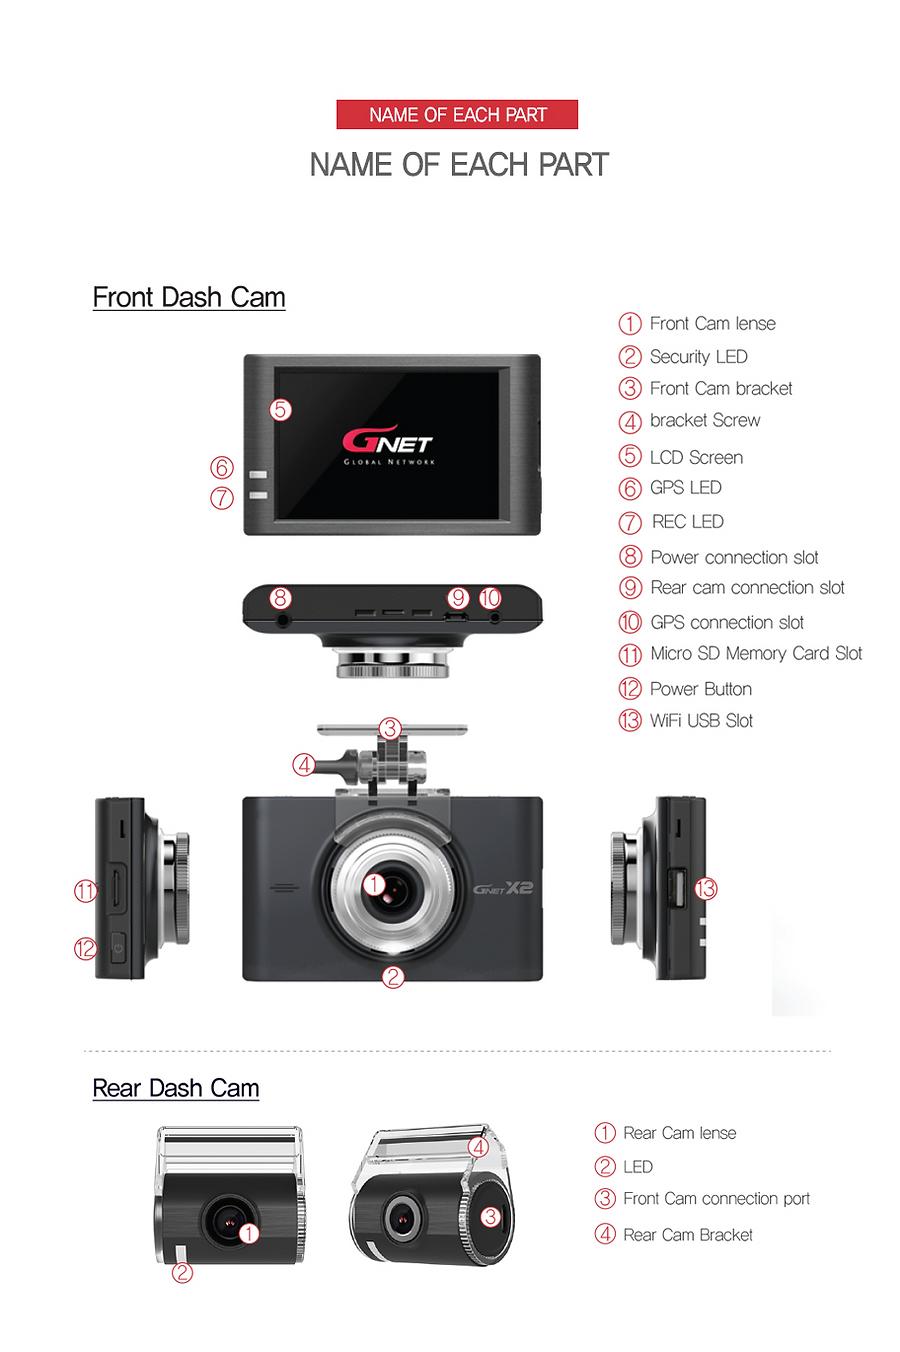 screenshot-www.gnetsystem.com-2019.07.11